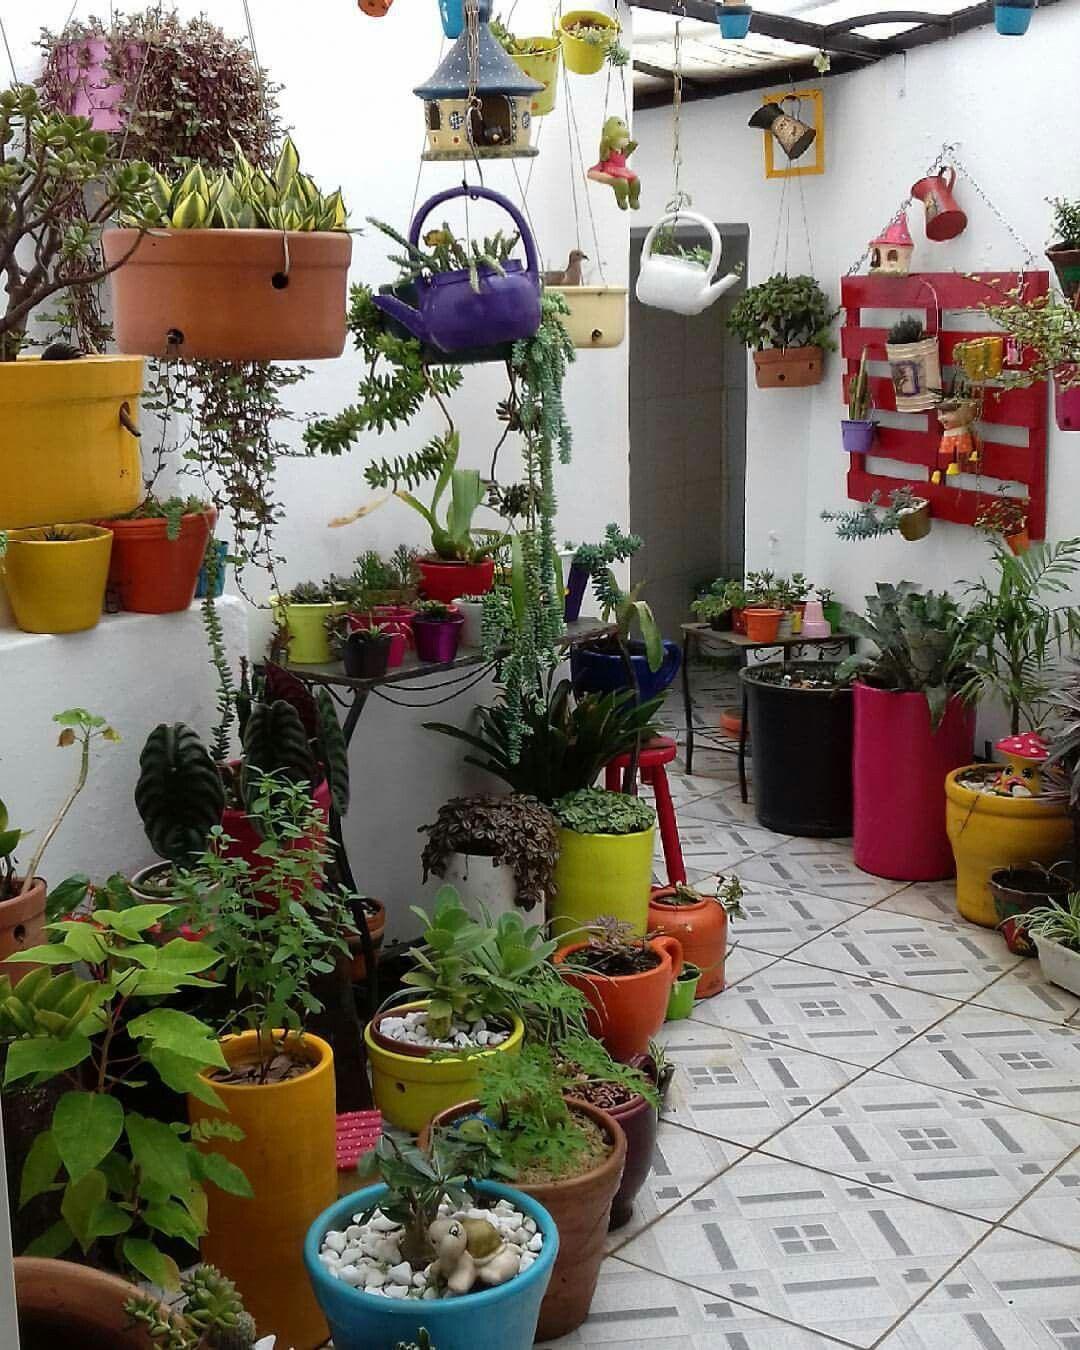 Garden Terrace Apartments: Pin By GLADYS ONDINA TRIMINIO NELSON On Jardin In 2019